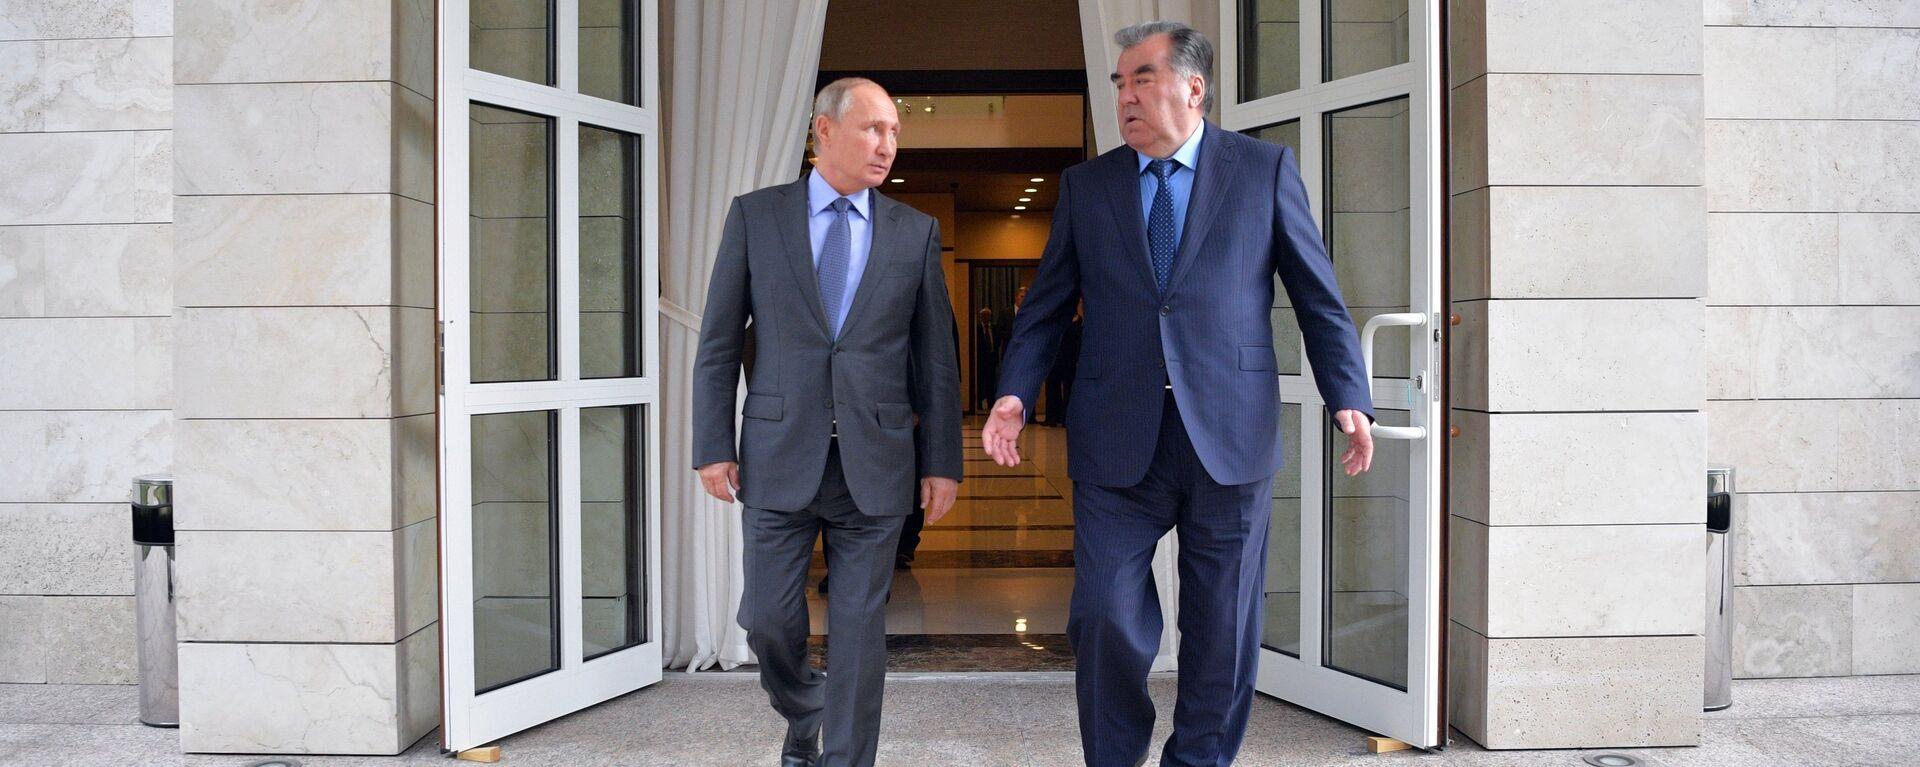 Встреча президента РФ В. Путина с президентом Таджикистана Э. Рахмоном - Sputnik Таджикистан, 1920, 07.10.2021